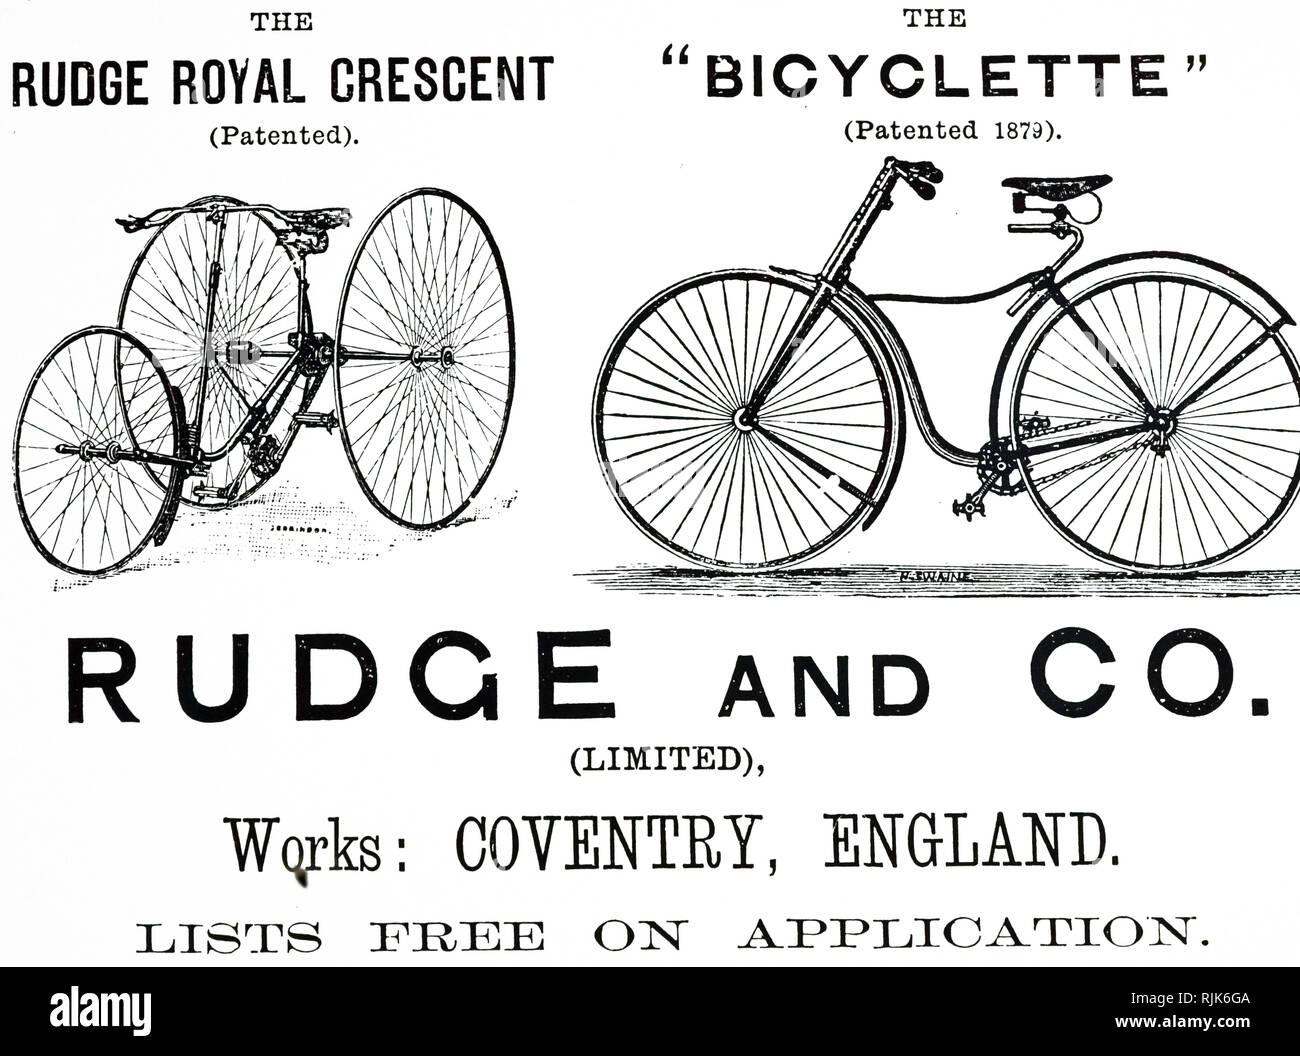 Rudge cykel dating